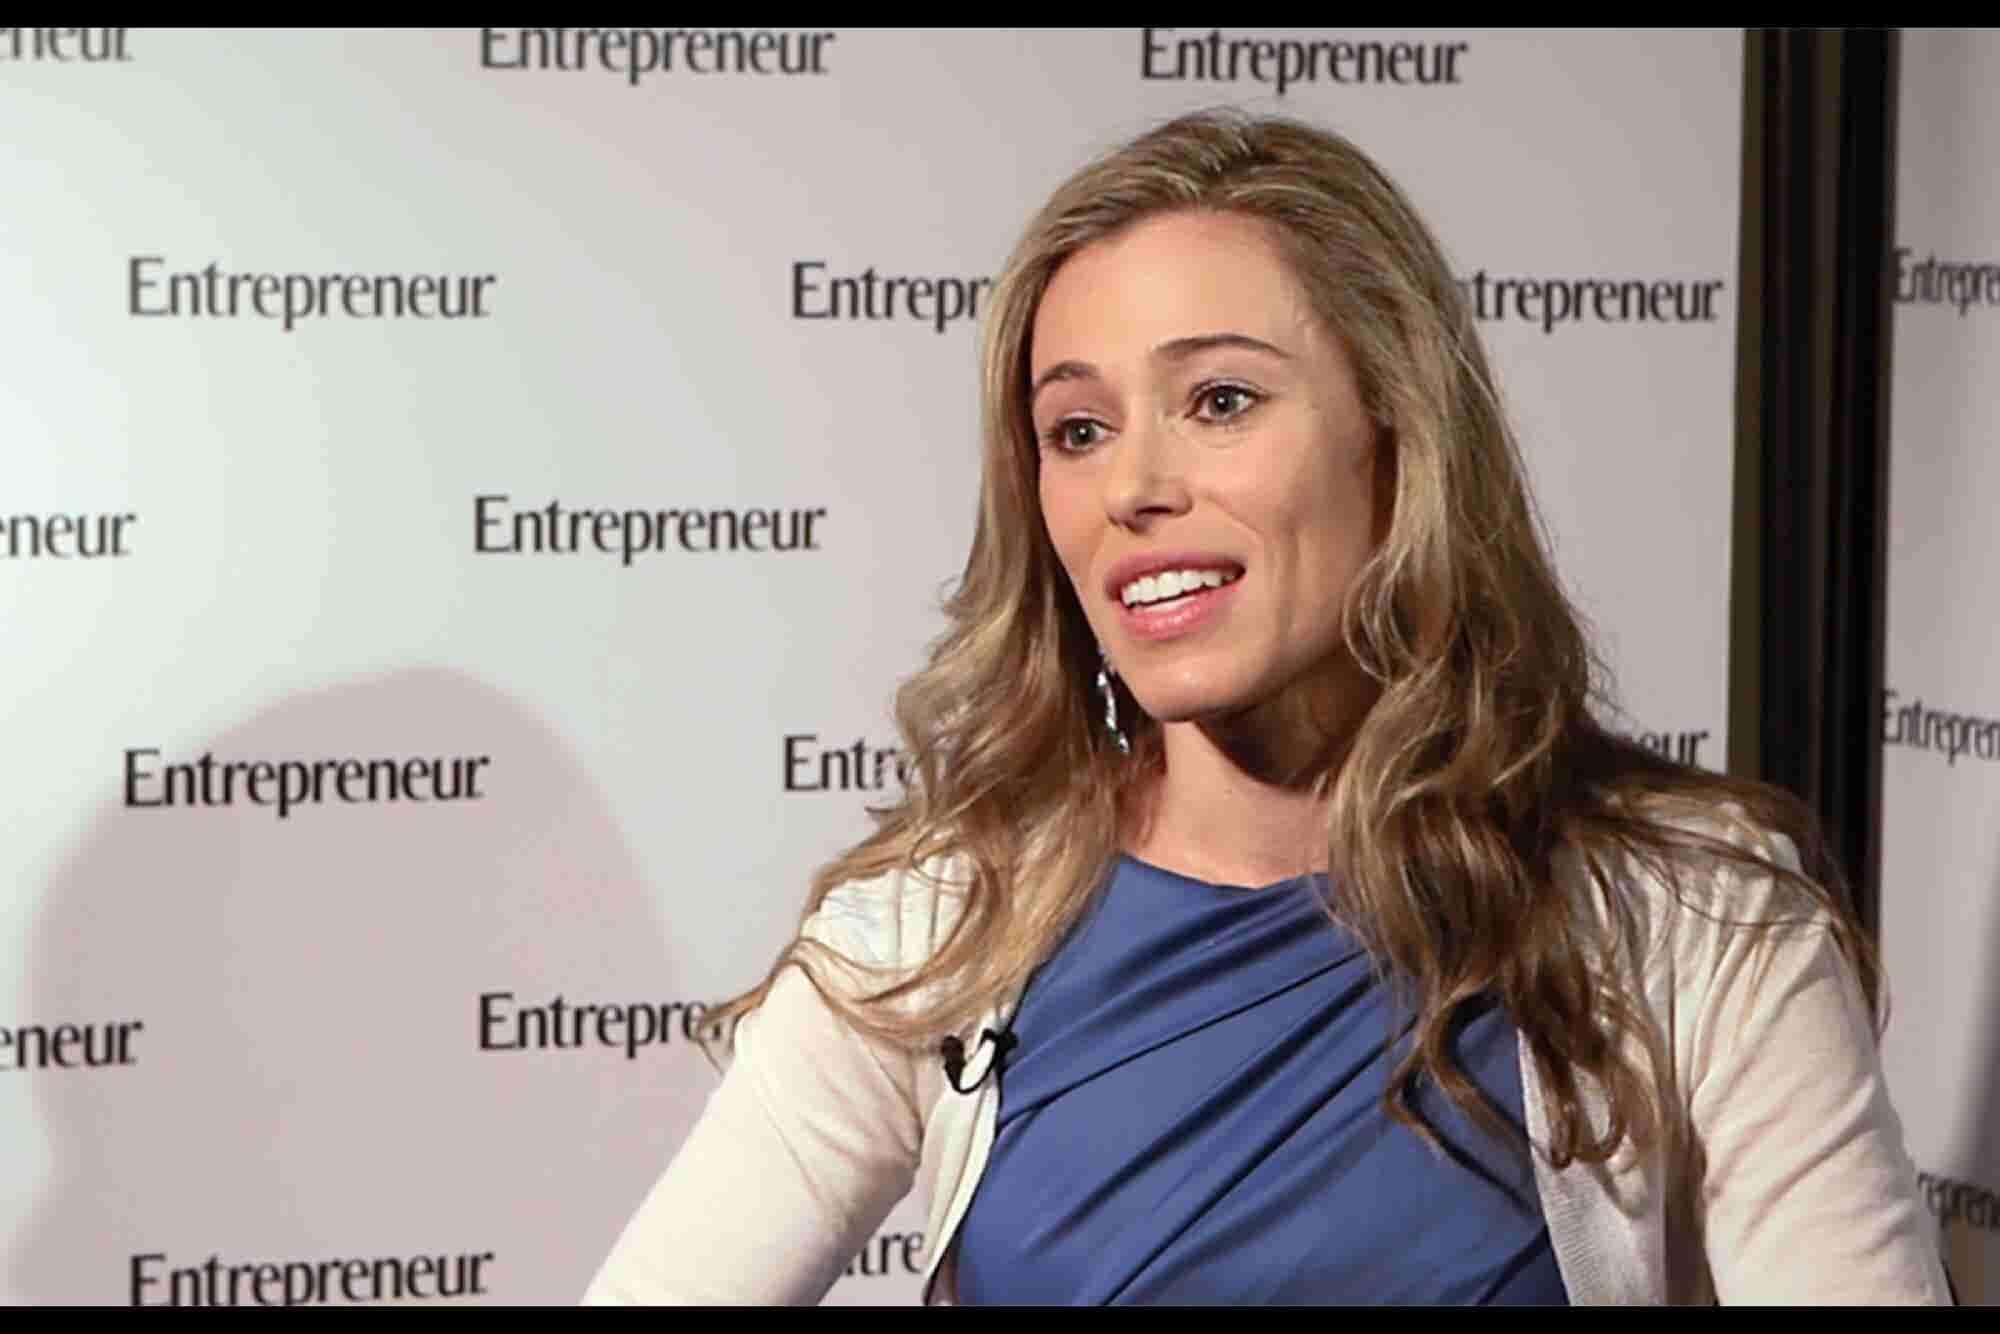 Emerging Entrepreneur of 2014 Winner: 'We've Had Many, Many Failures'